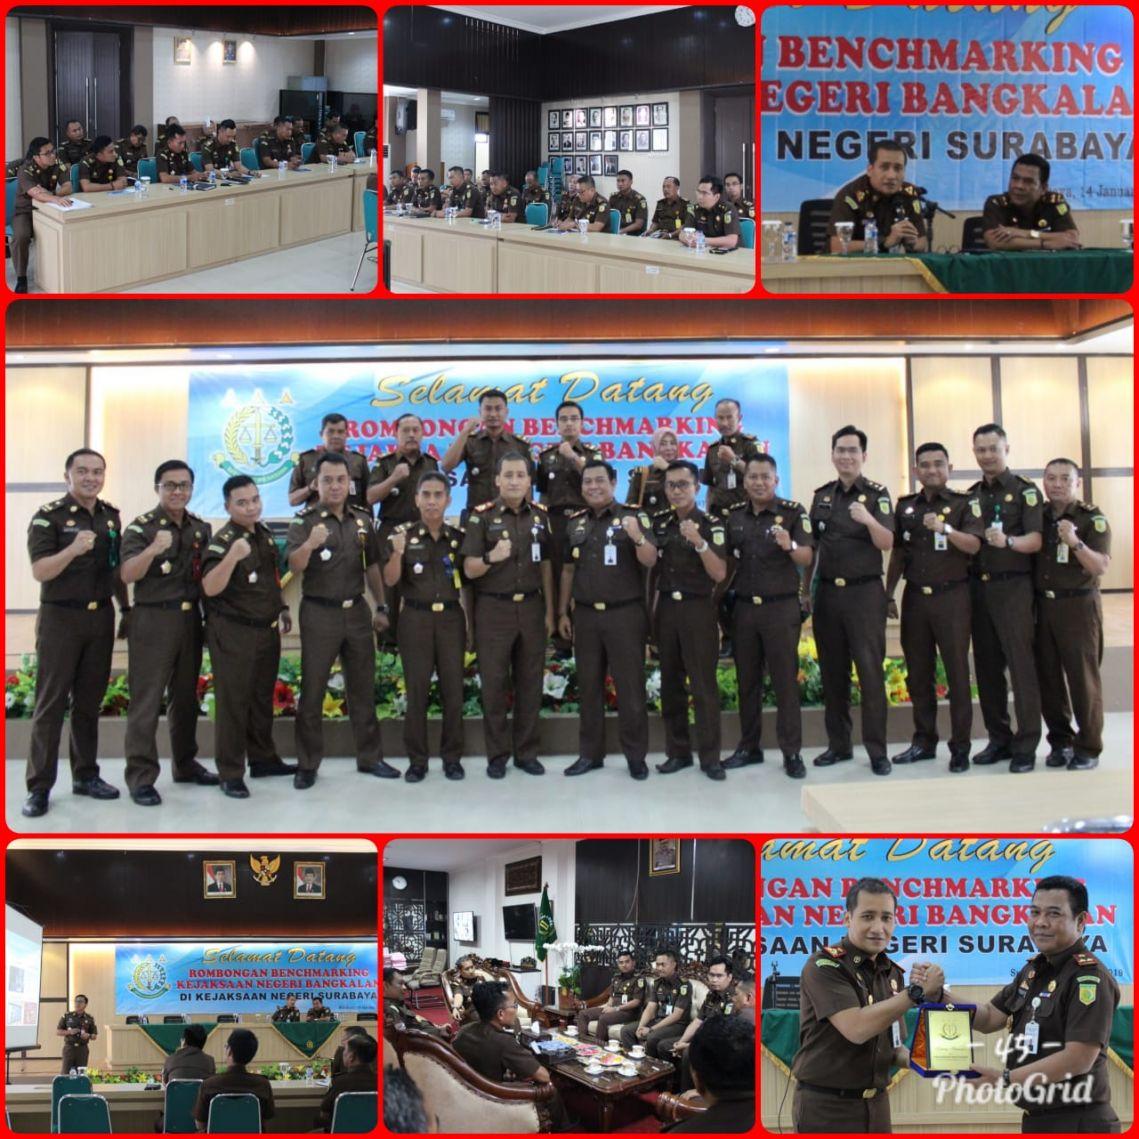 Benchmarking Kejaksaan Negeri Bangkalan 14-01-2019